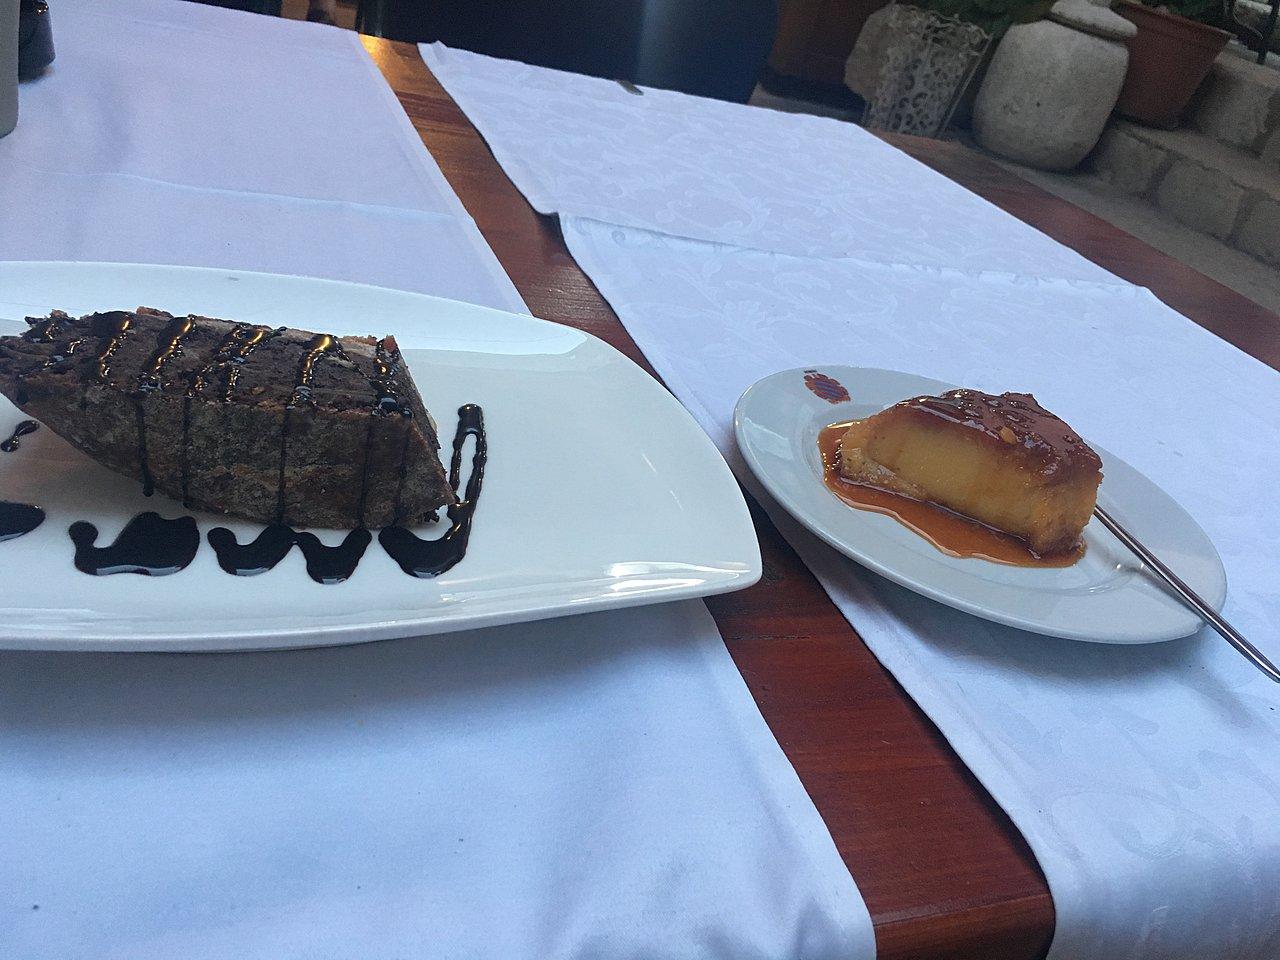 dessert time | Photo taken by Emilia S